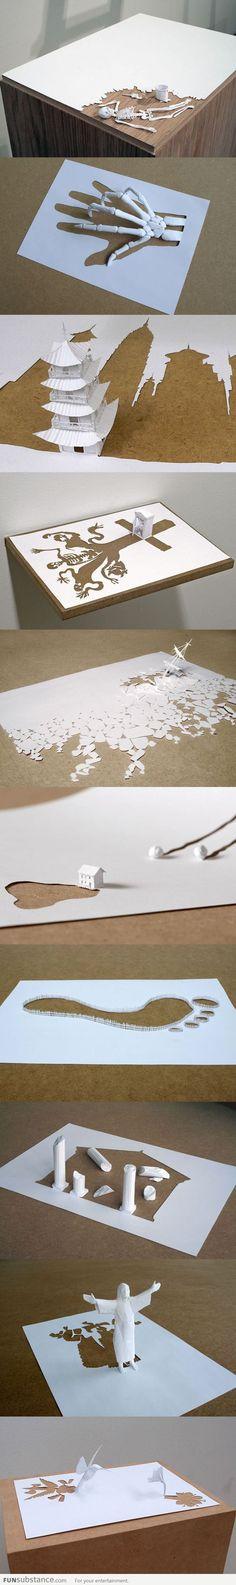 Mind blowing paper art by Peter Callesen